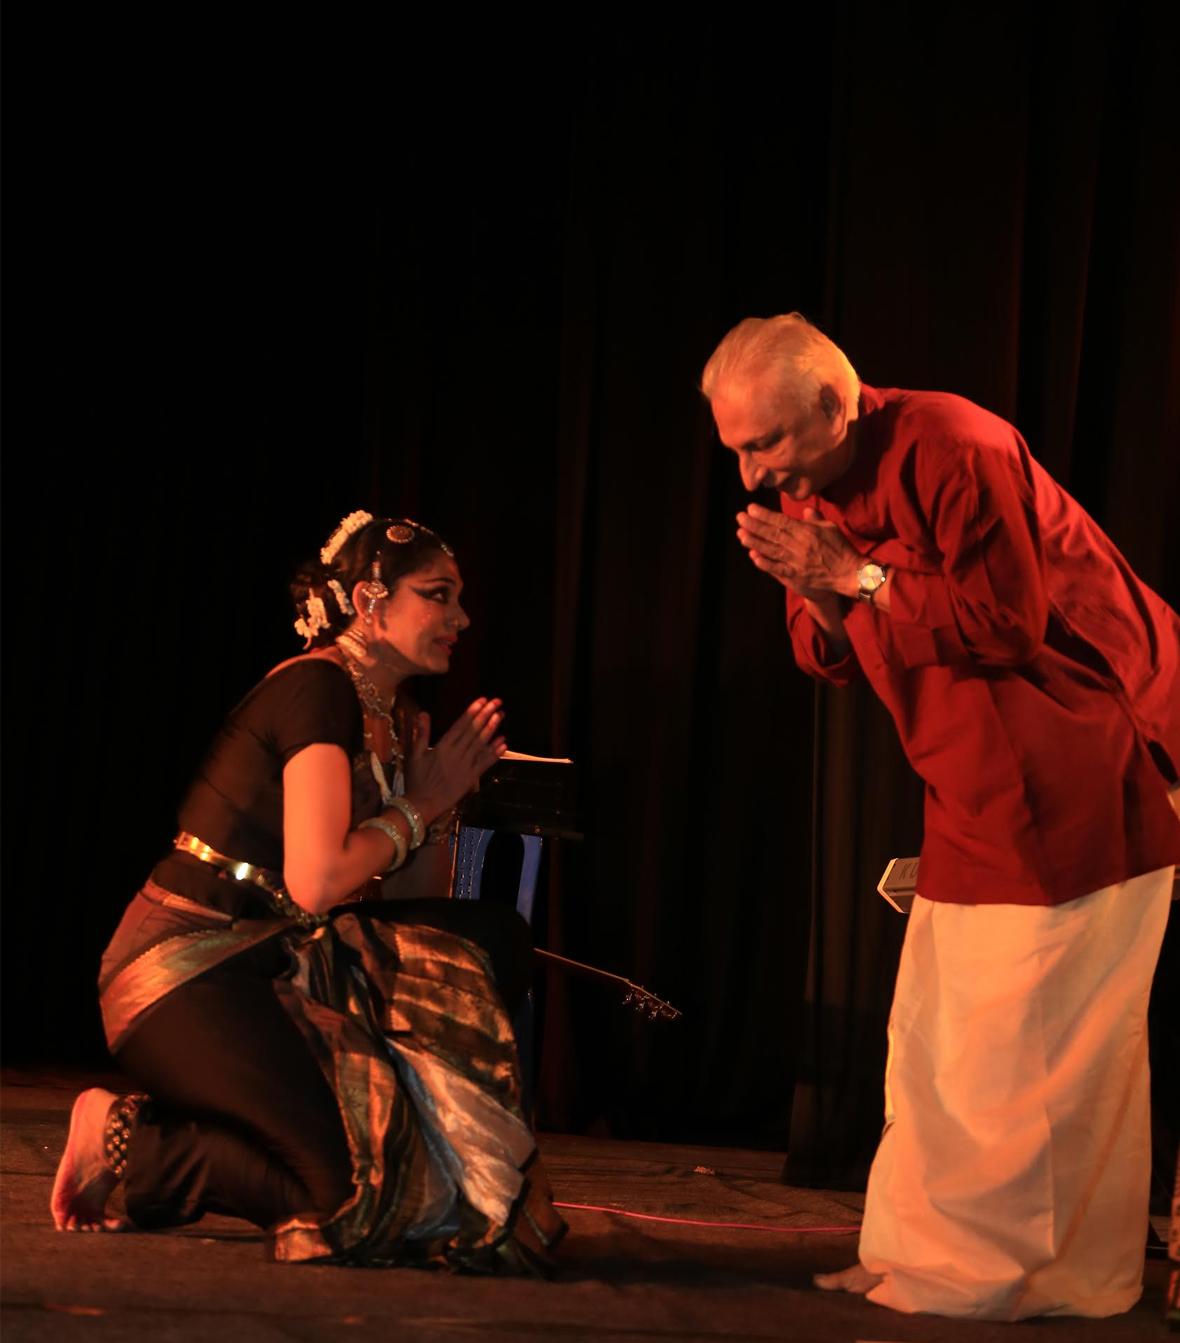 Sri-M-with-Padamshree-Shobana-Walk-of-Hope-2015-16-Fundraiser